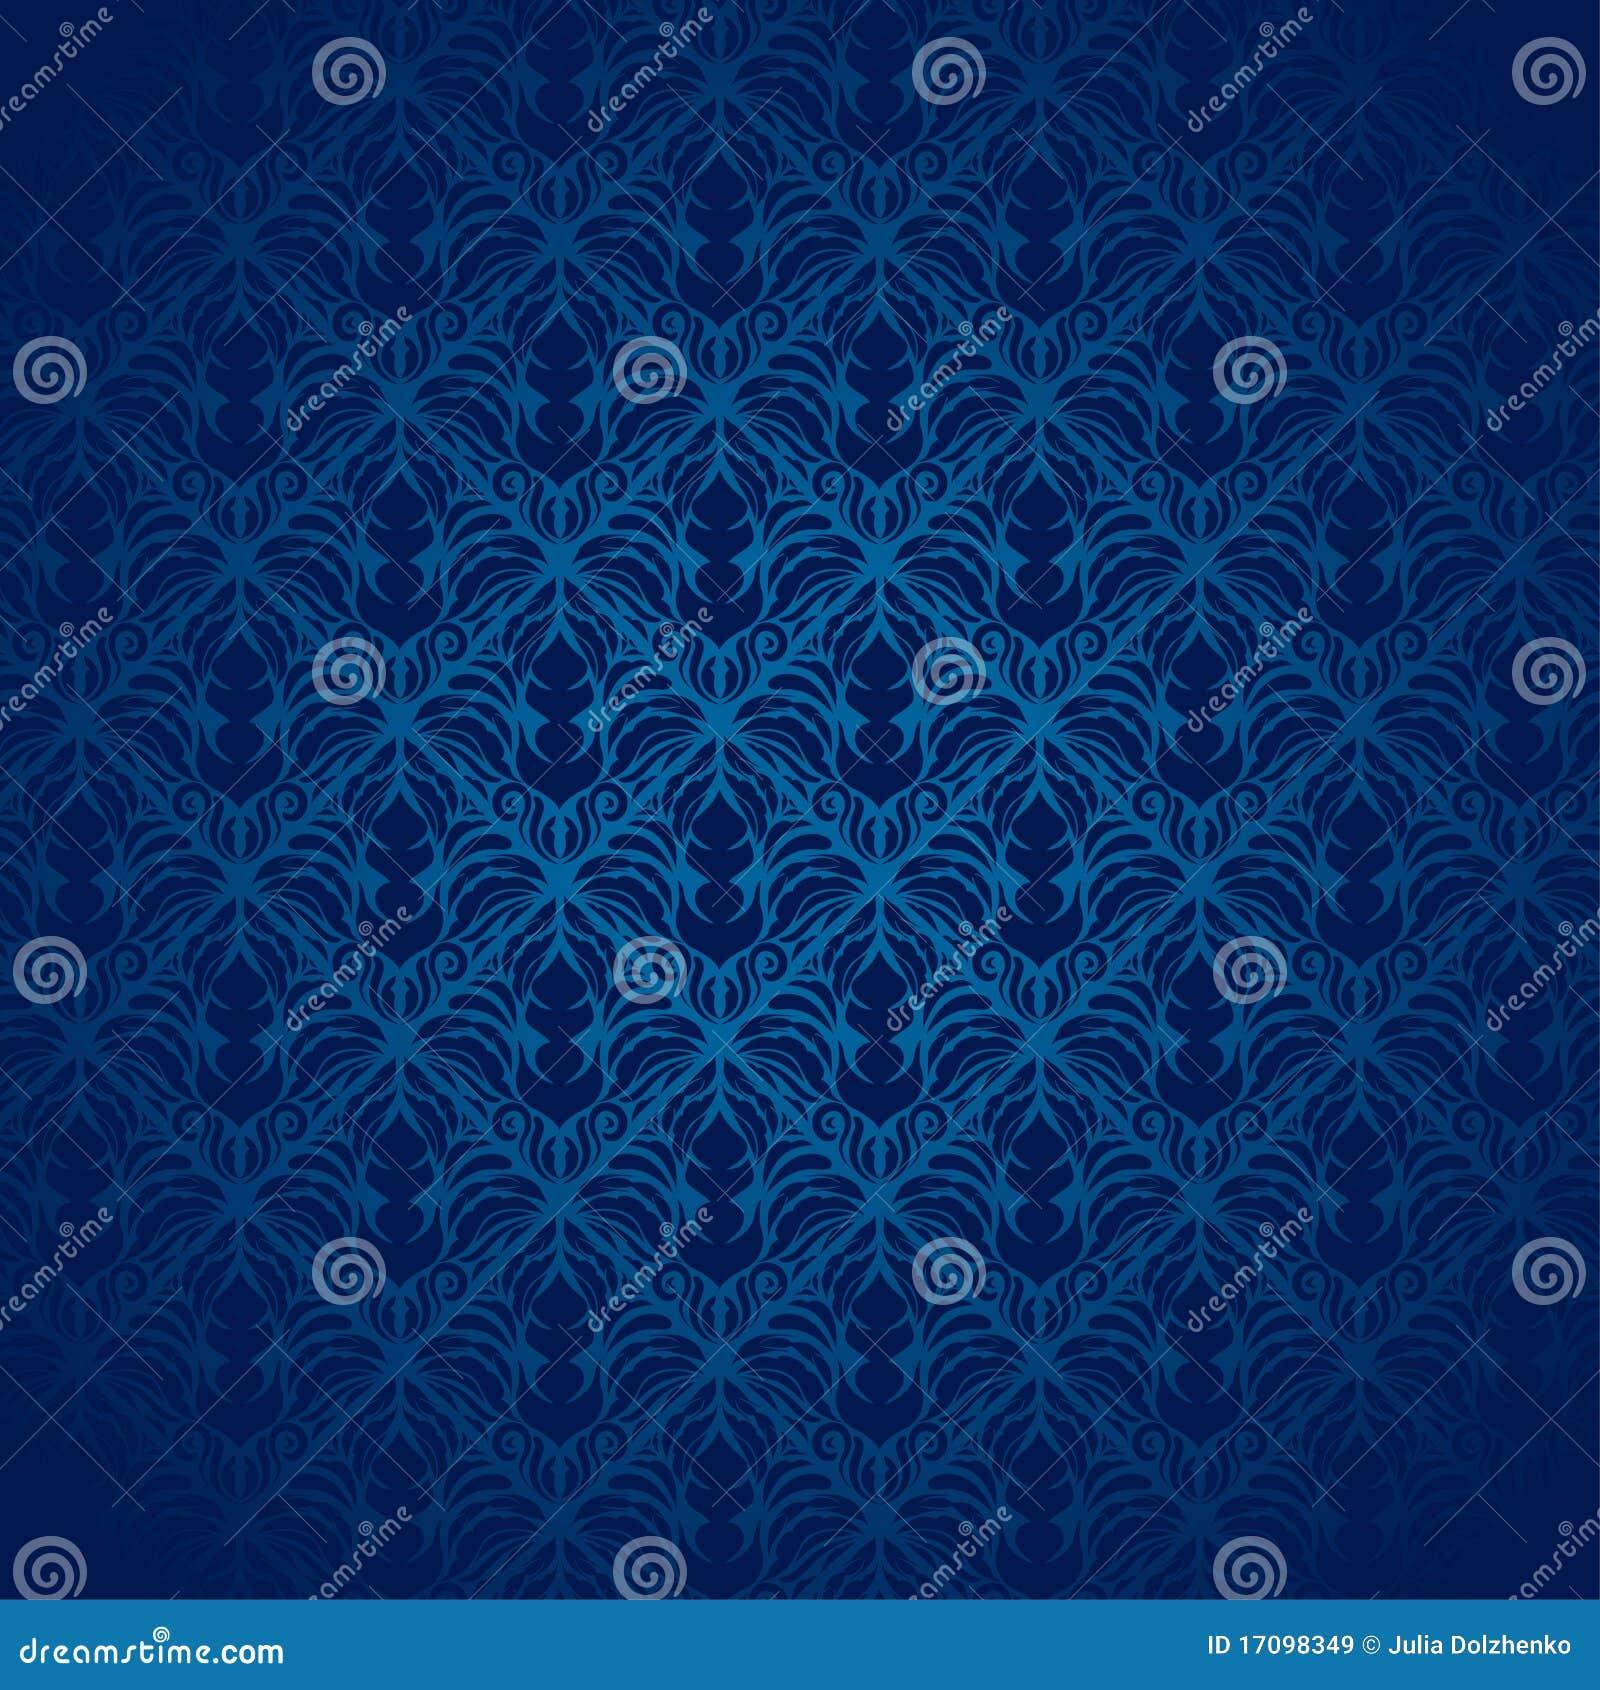 Blaues Damast-Muster